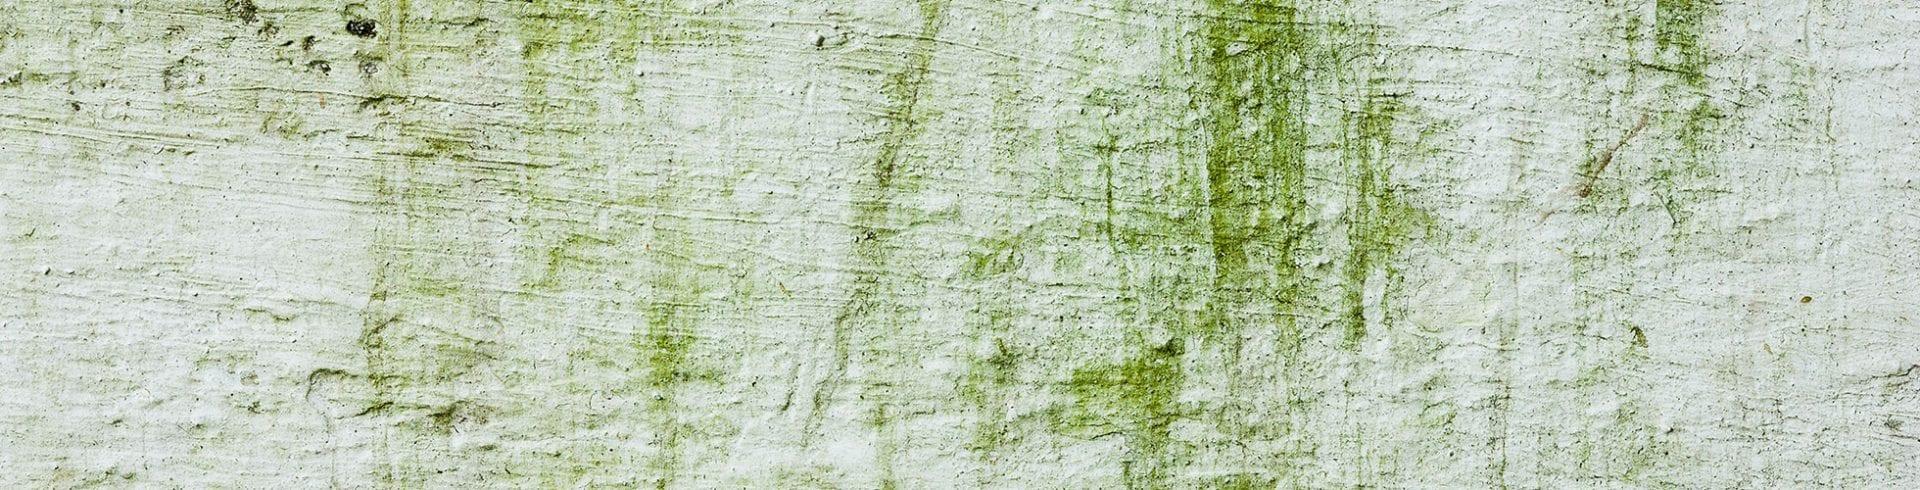 Mold Removal on Concrete, Brick & Driveways | Blog | MoldOff®